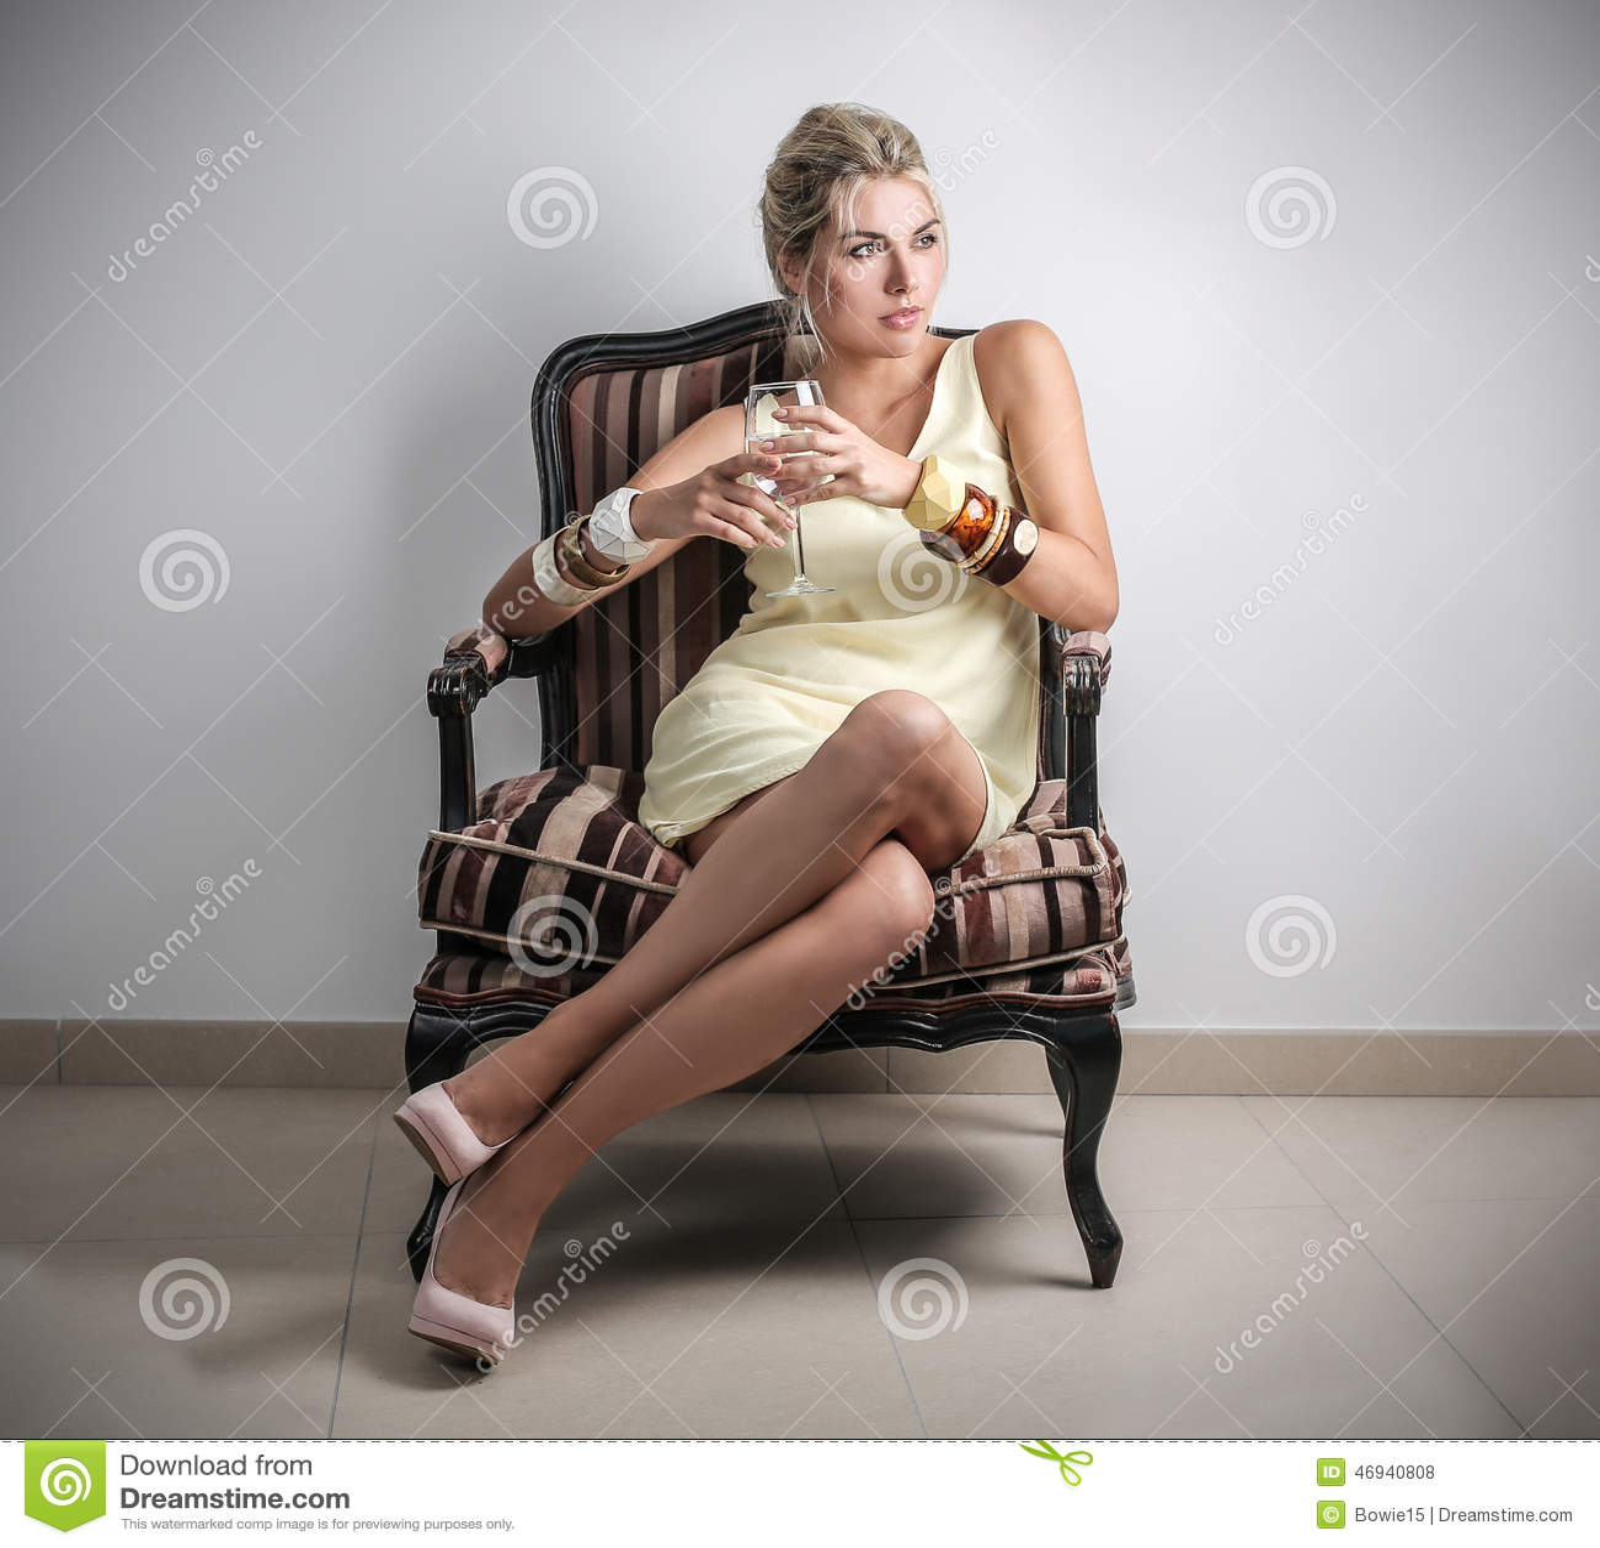 Classy Woman Stock Photo Image 46940808